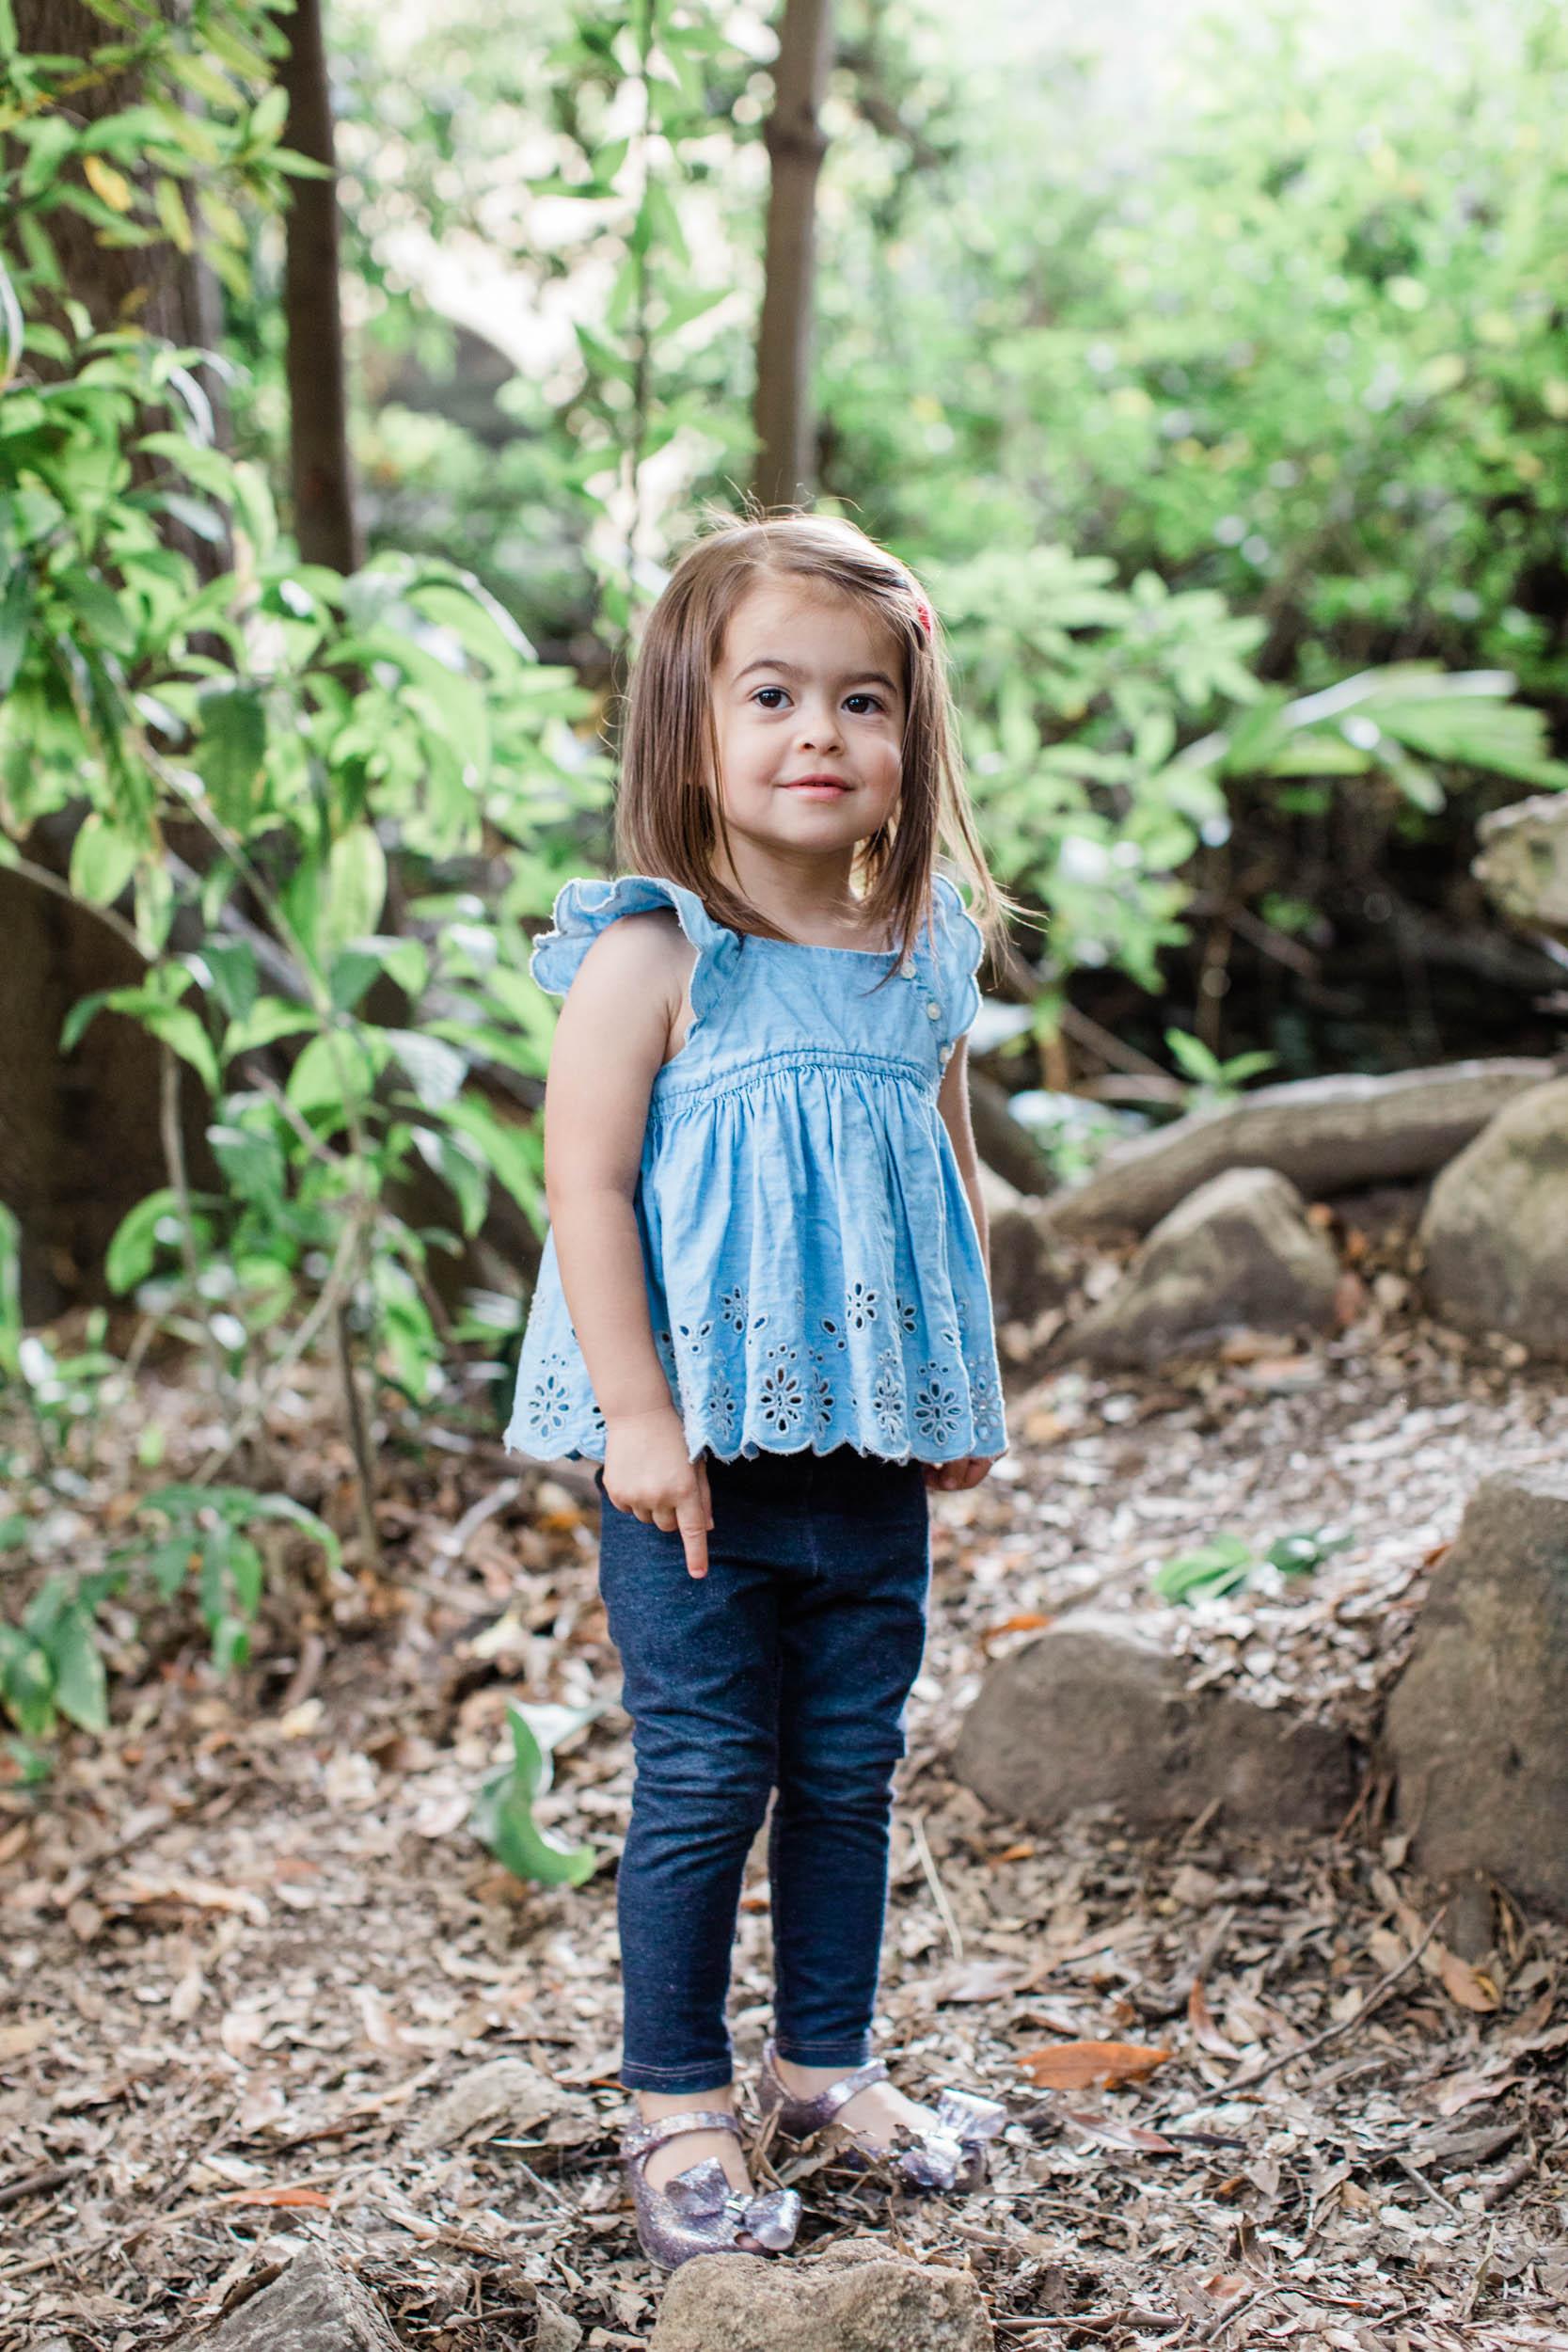 BKM-Photography-Los-Angeles-Los-Feliz-Family-Session-Fern-Dell-Child-Photographer-0013.jpg